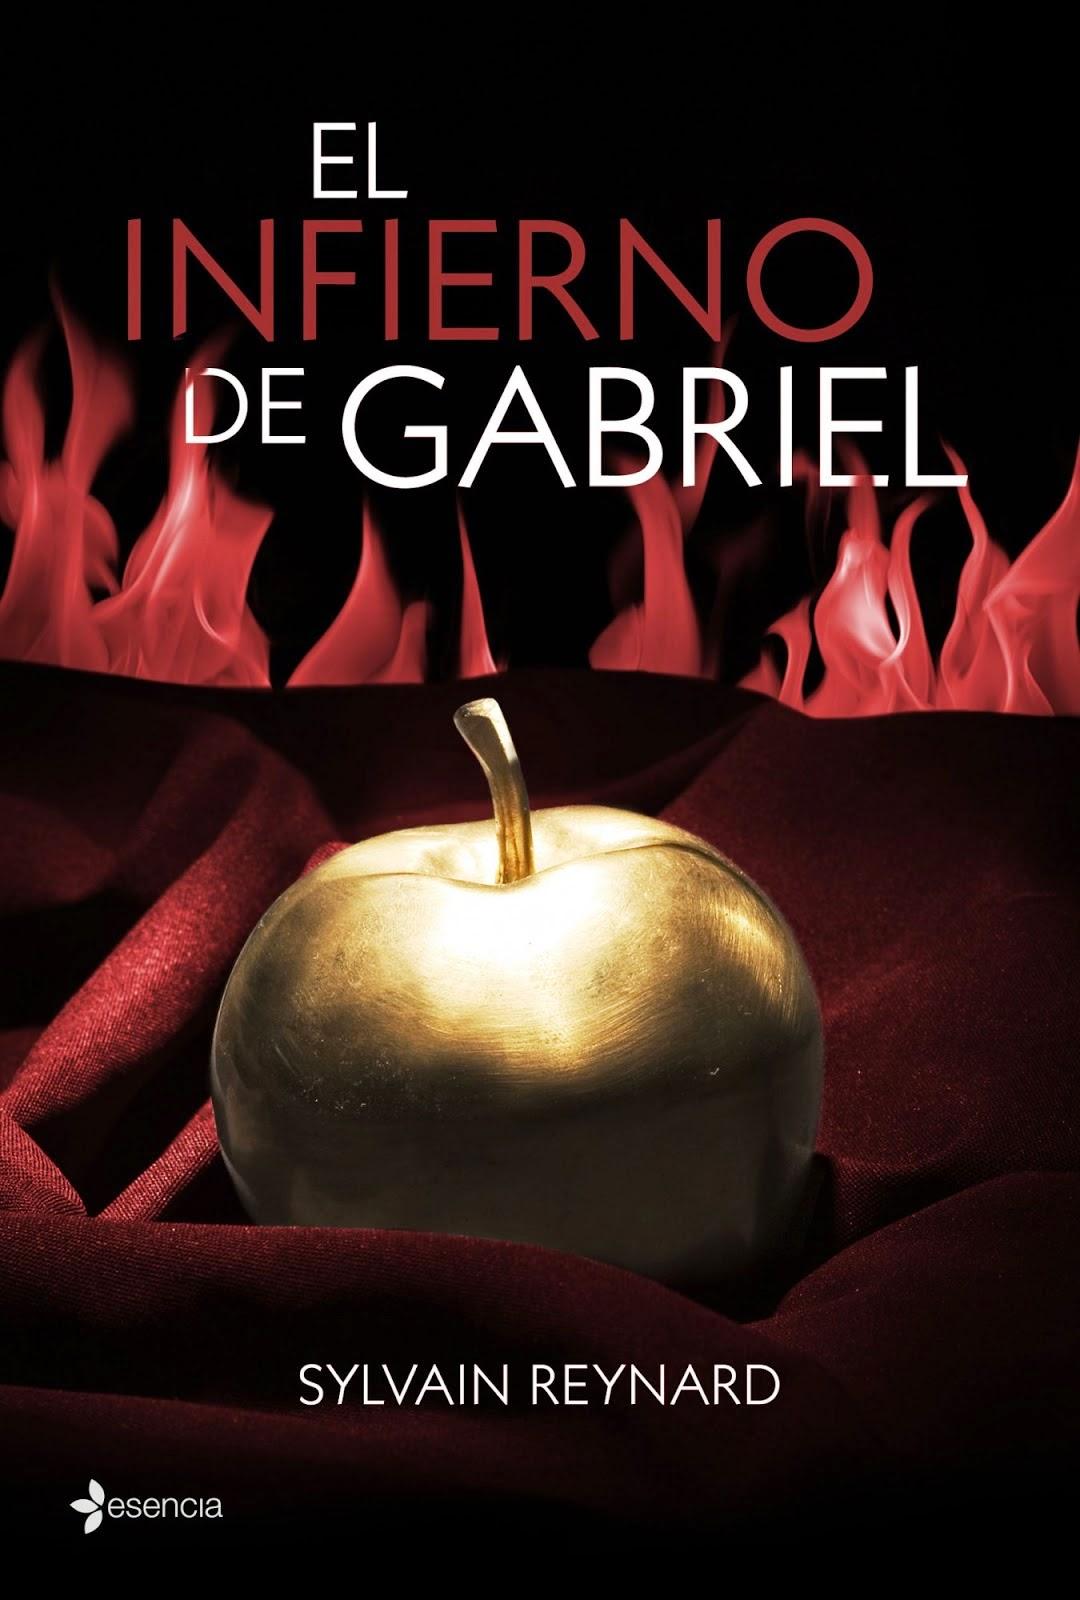 http://lavidadeunalectoraa.blogspot.mx/2015/03/resena-el-infierno-de-gabriel-gabriels.html